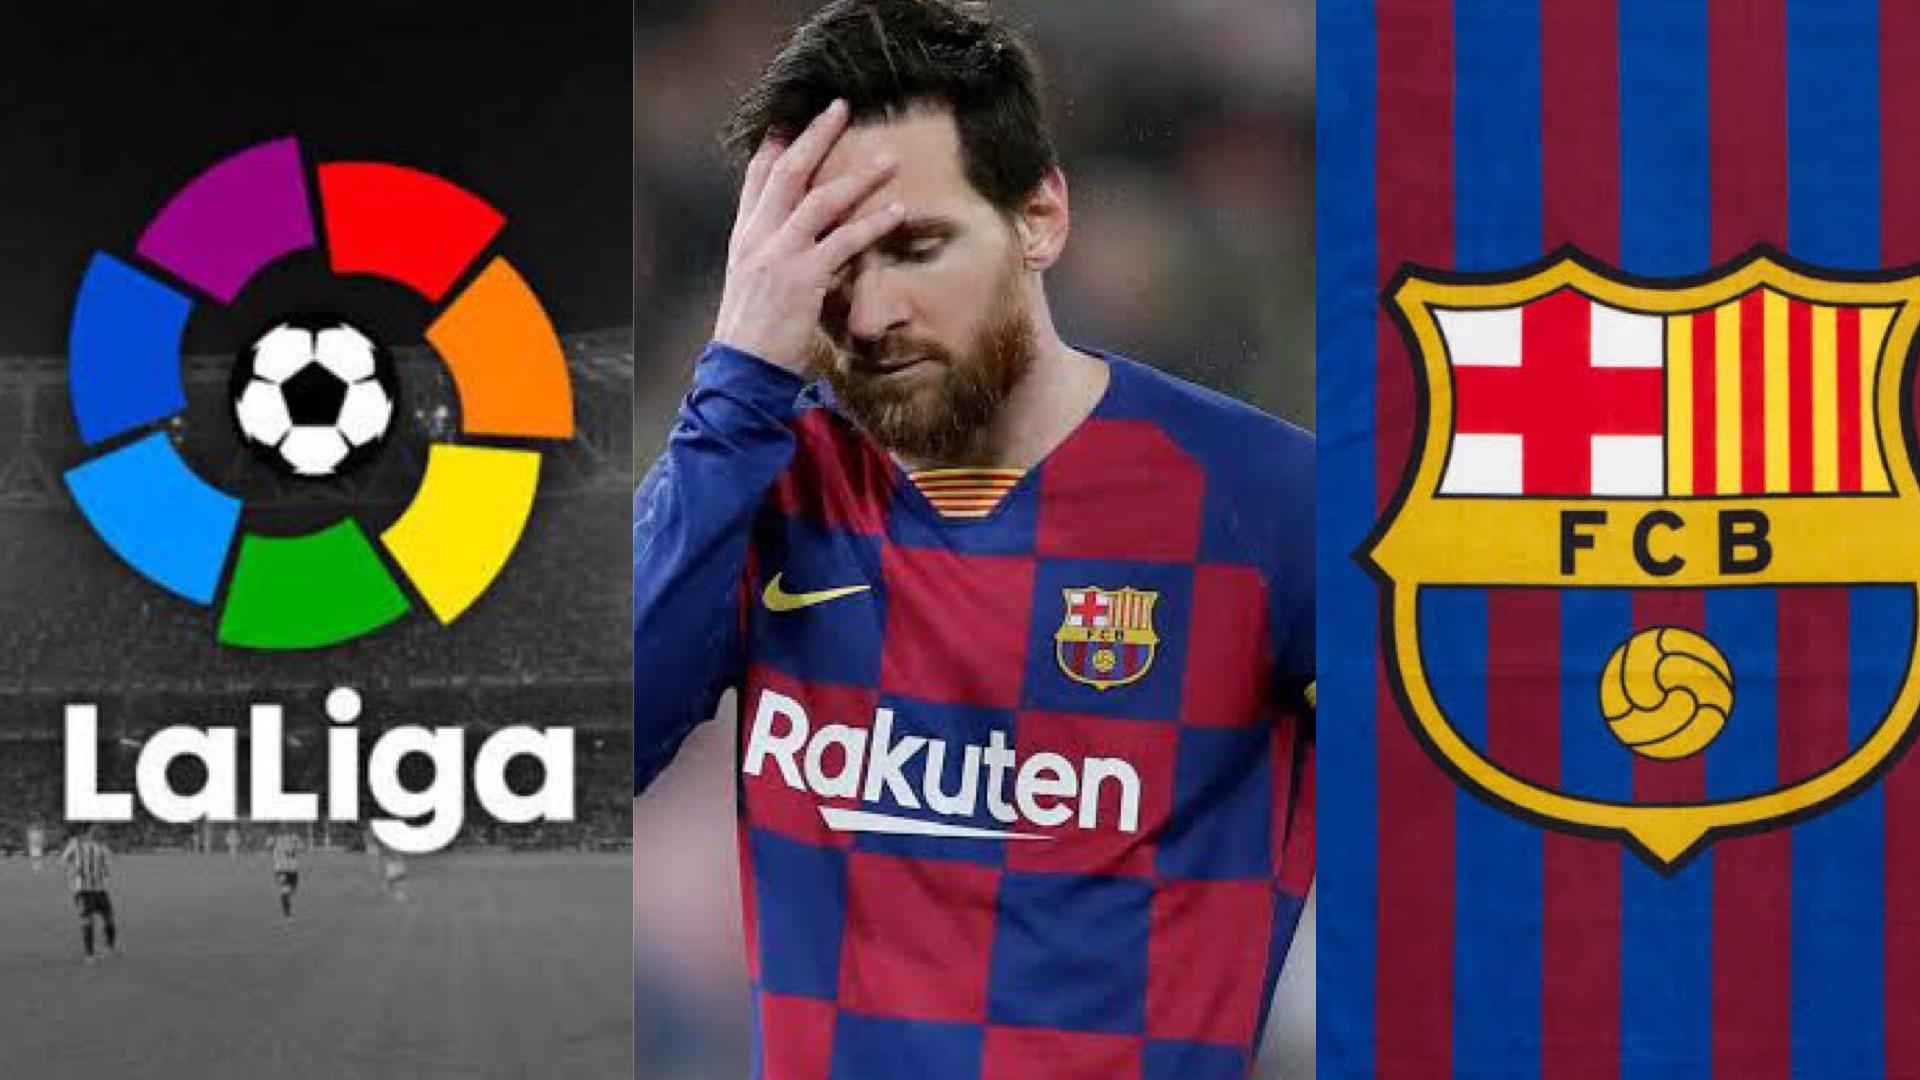 La Liga Backs Barcelona On Payment Of €700m For Messi's Exit